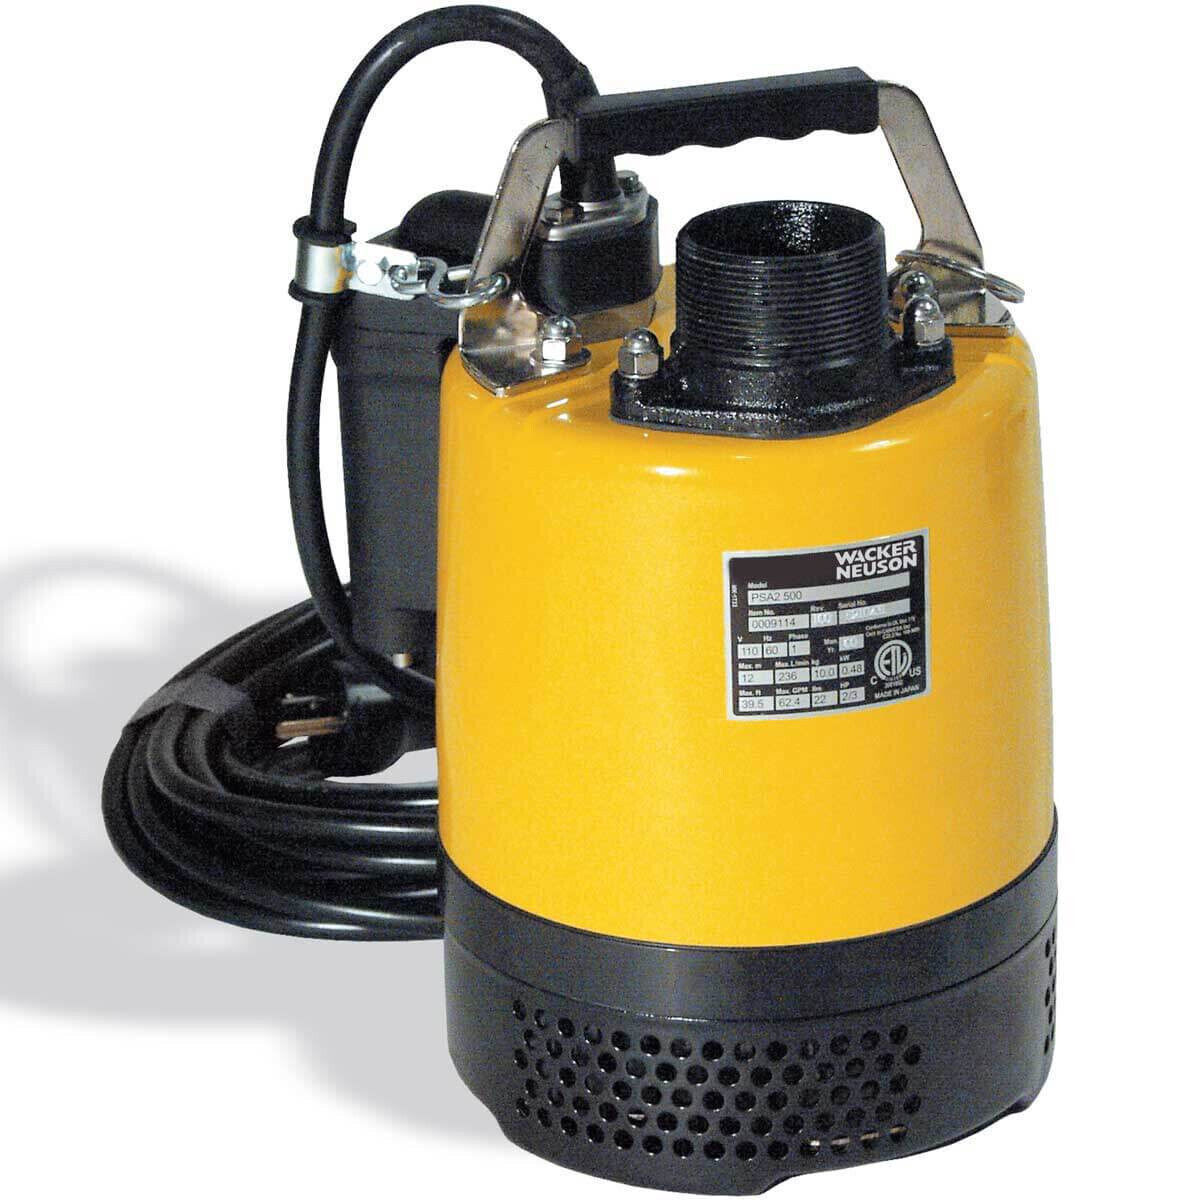 Wacker PSA 2 500 2 inch Submersible Pump